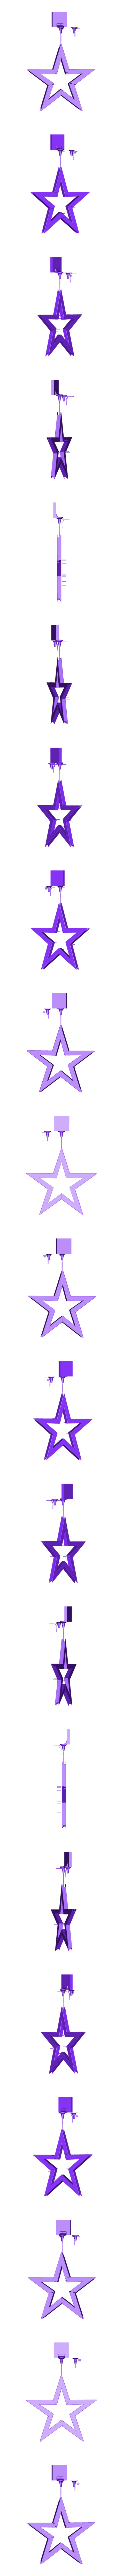 Vega_-_The_LED-lit_Christmas_Star__complete_assembly_.stl Download free STL file Vega - The LED-lit Christmas Star • 3D print model, CreativeTools